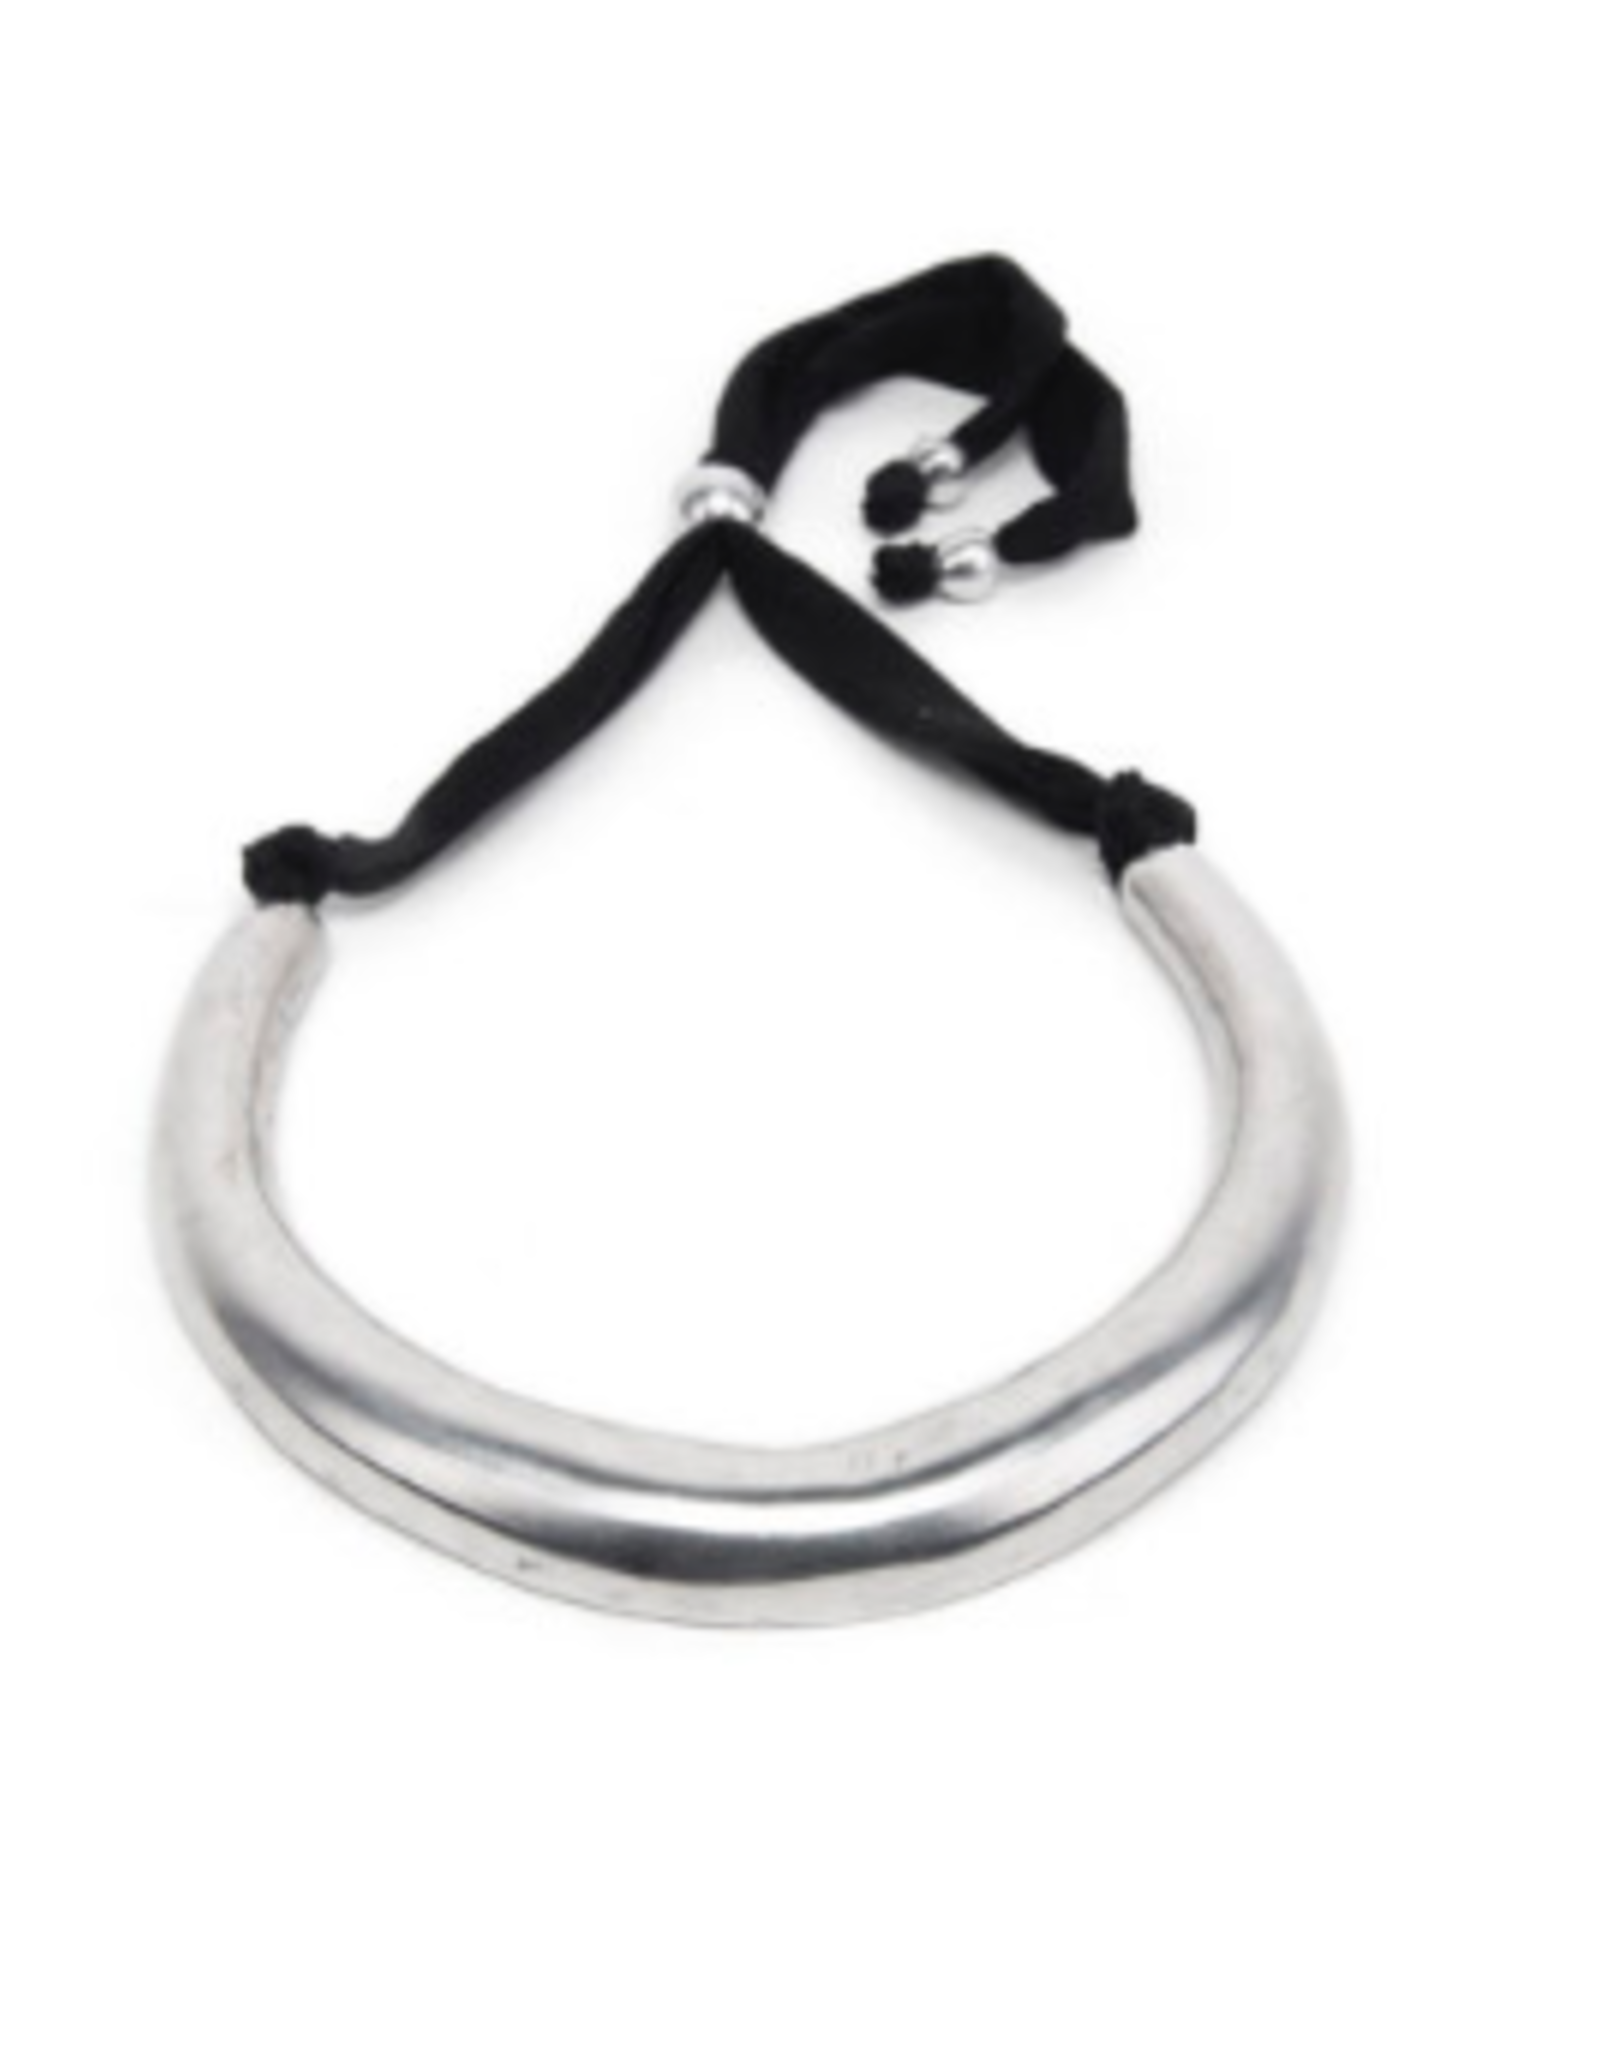 VESTOPAZZO Aluminum Collar Necklace